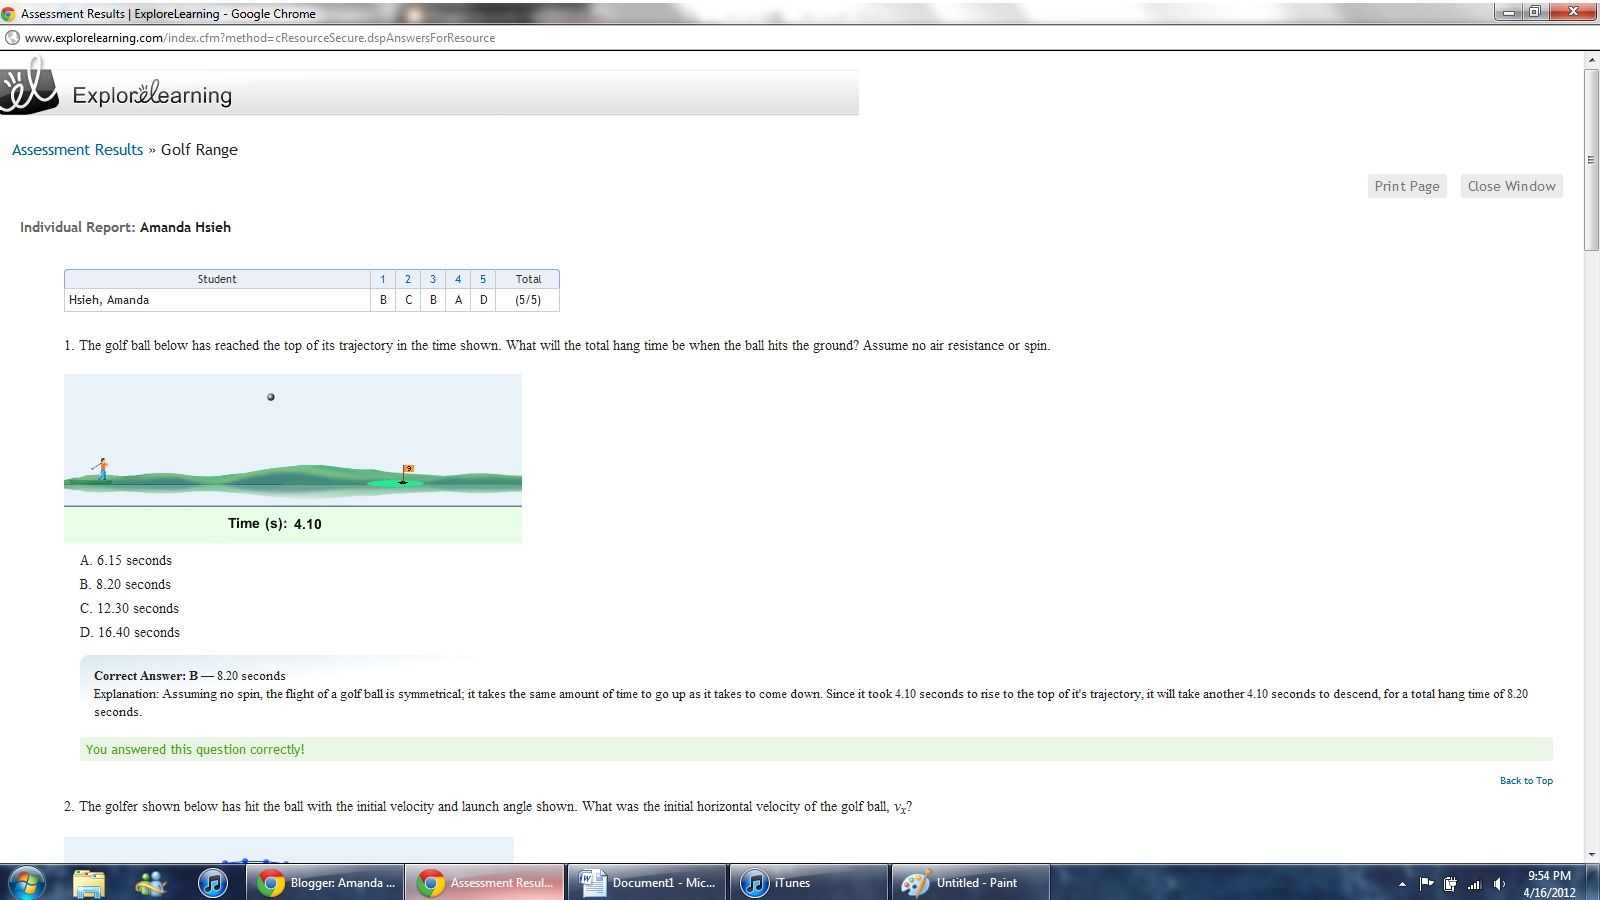 Amanda Hsieh's Blog (Grade 11 Physics)